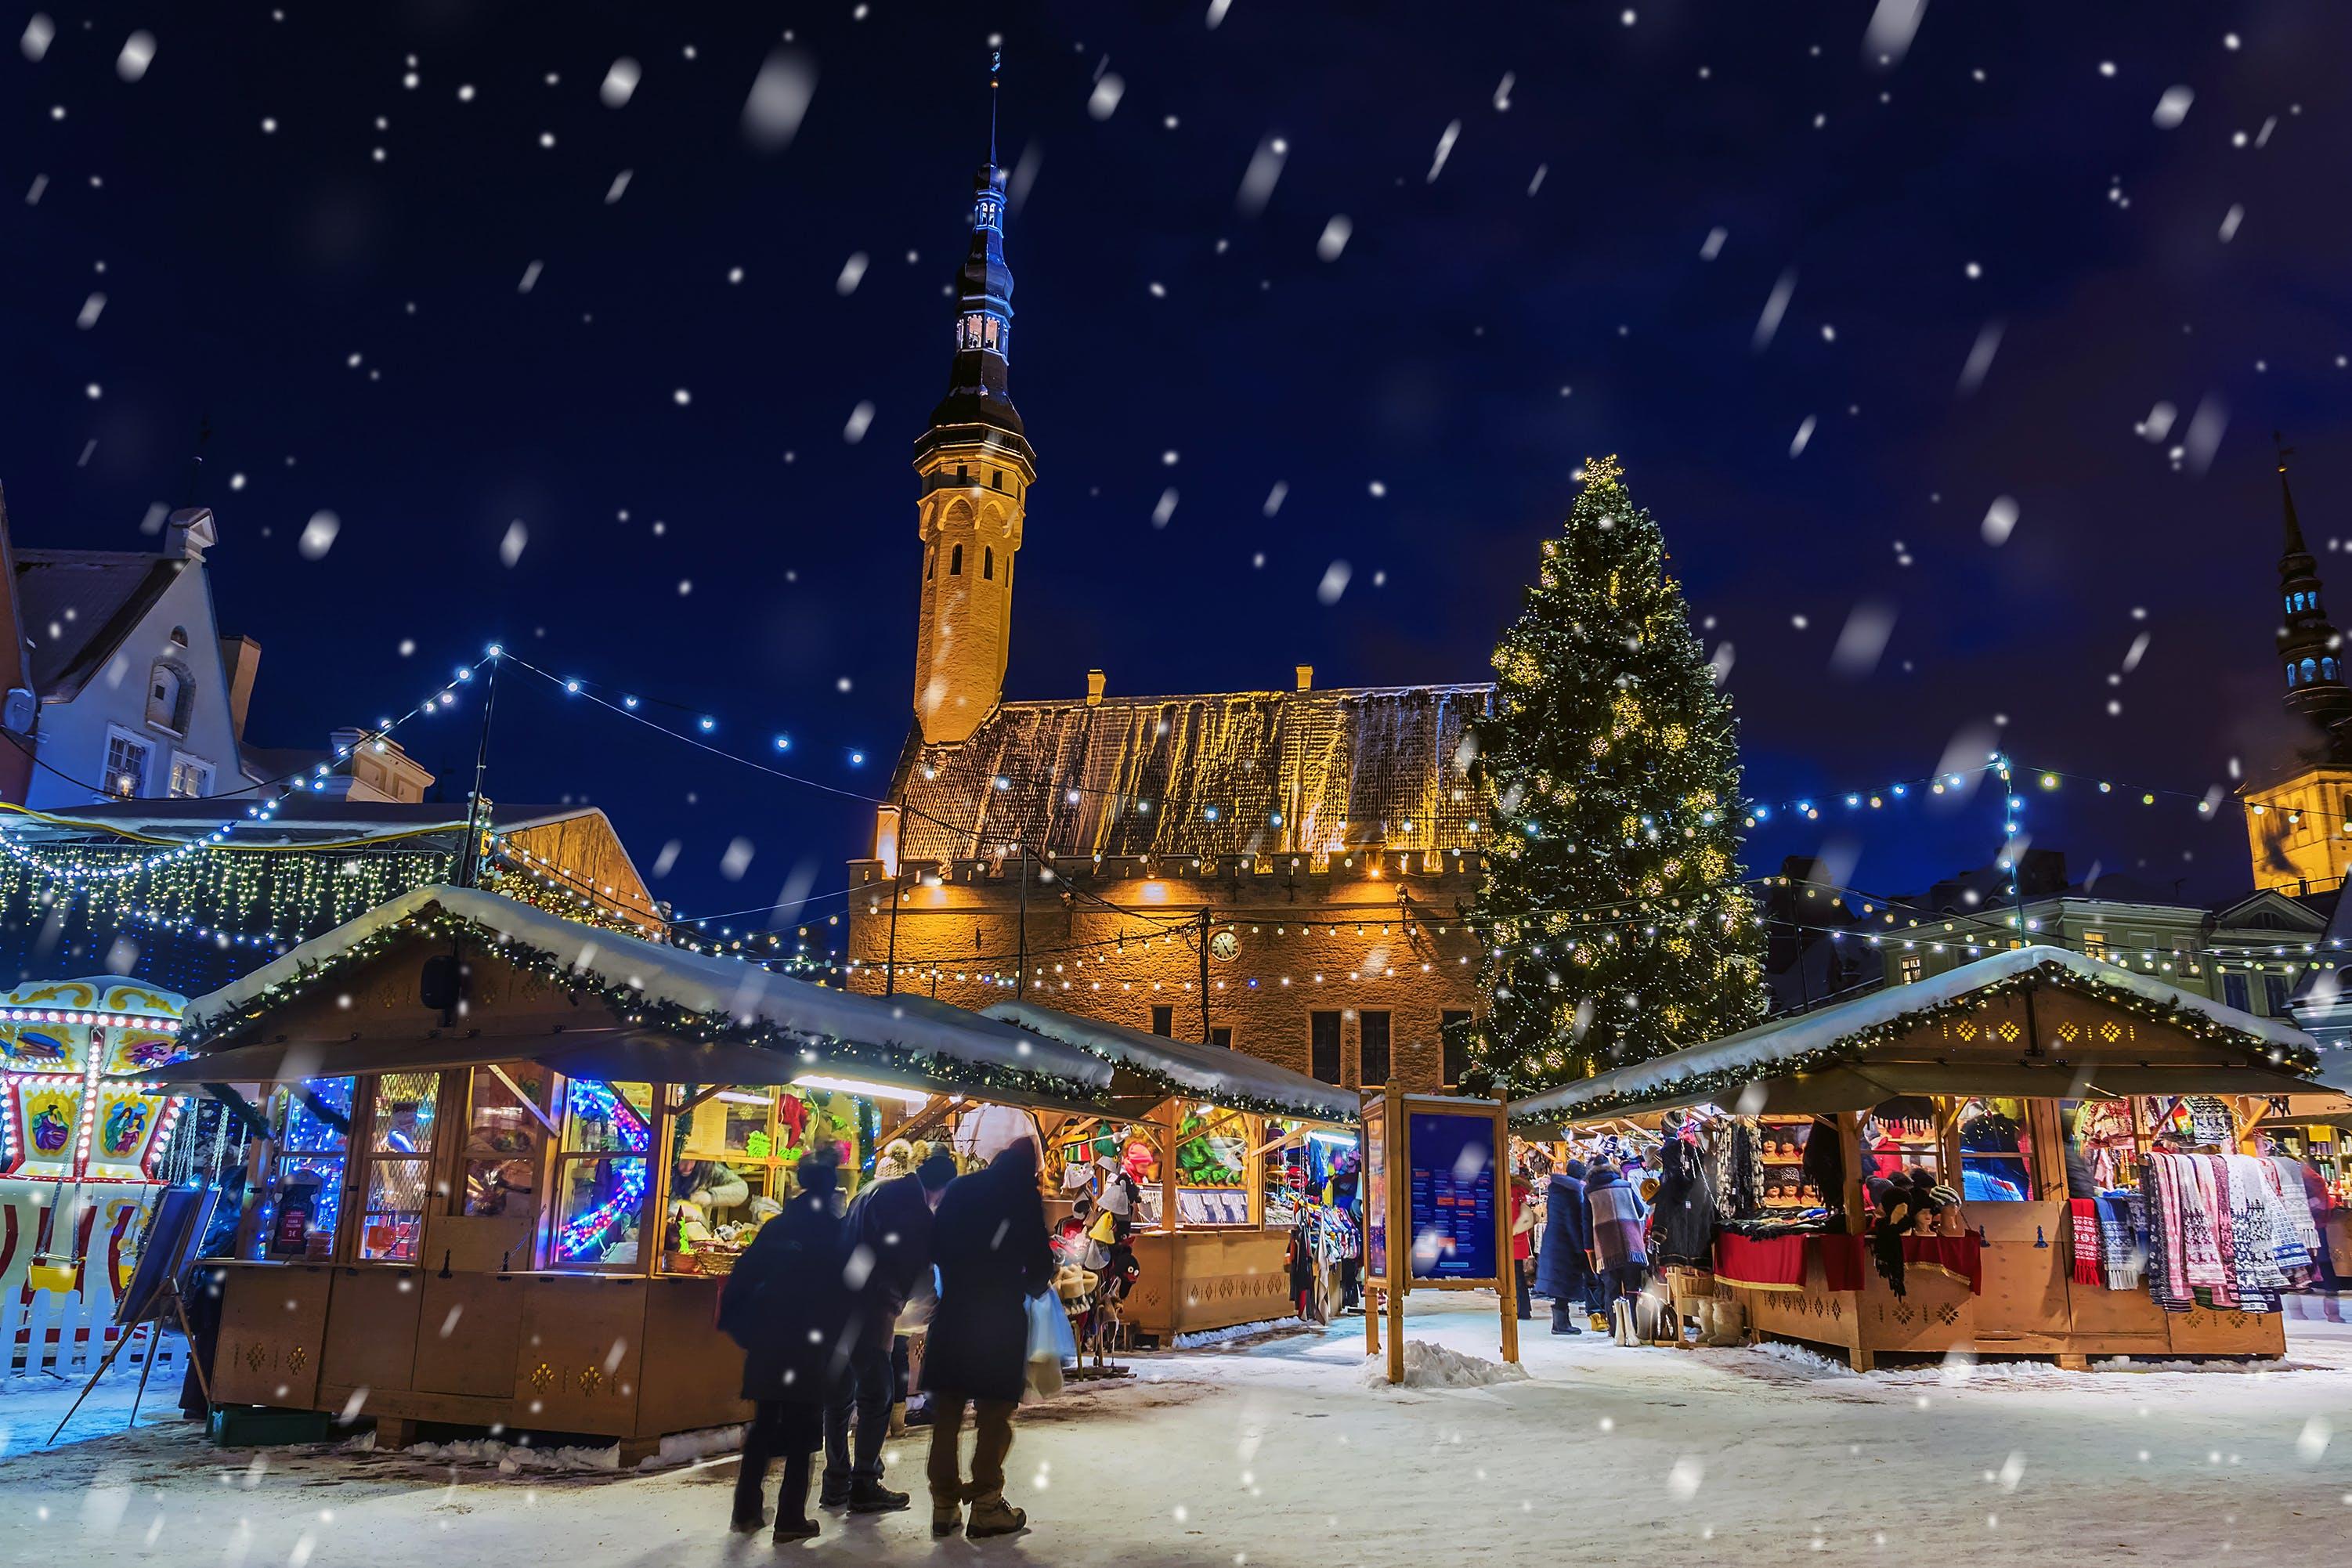 Christmas Market, Europe